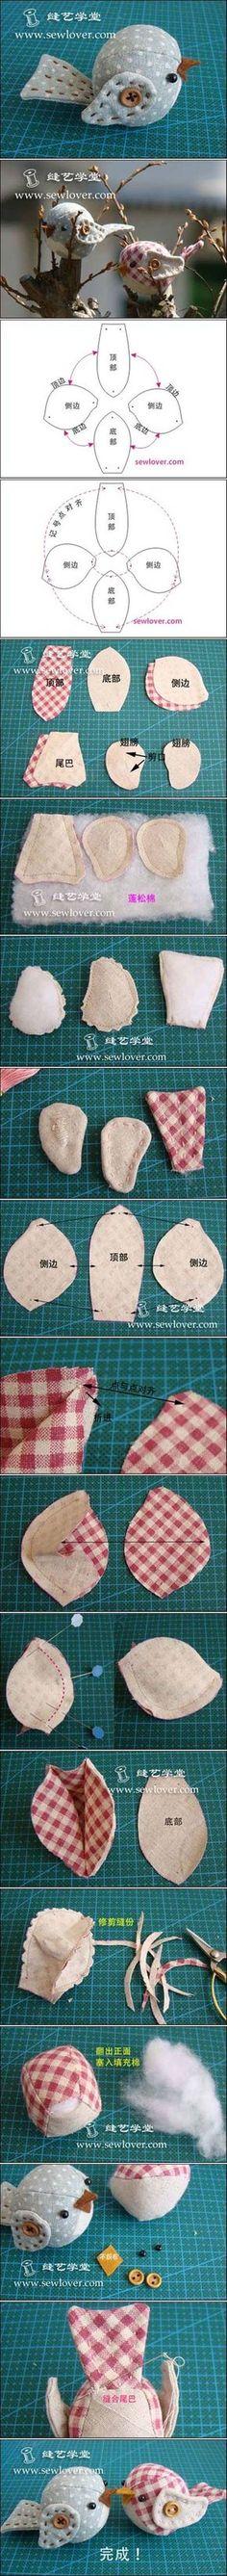 DIY Little Fabric Bird DIY Projects | UsefulDIY.com Follow Us on Facebook ==> http://www.facebook.com/UsefulDiy